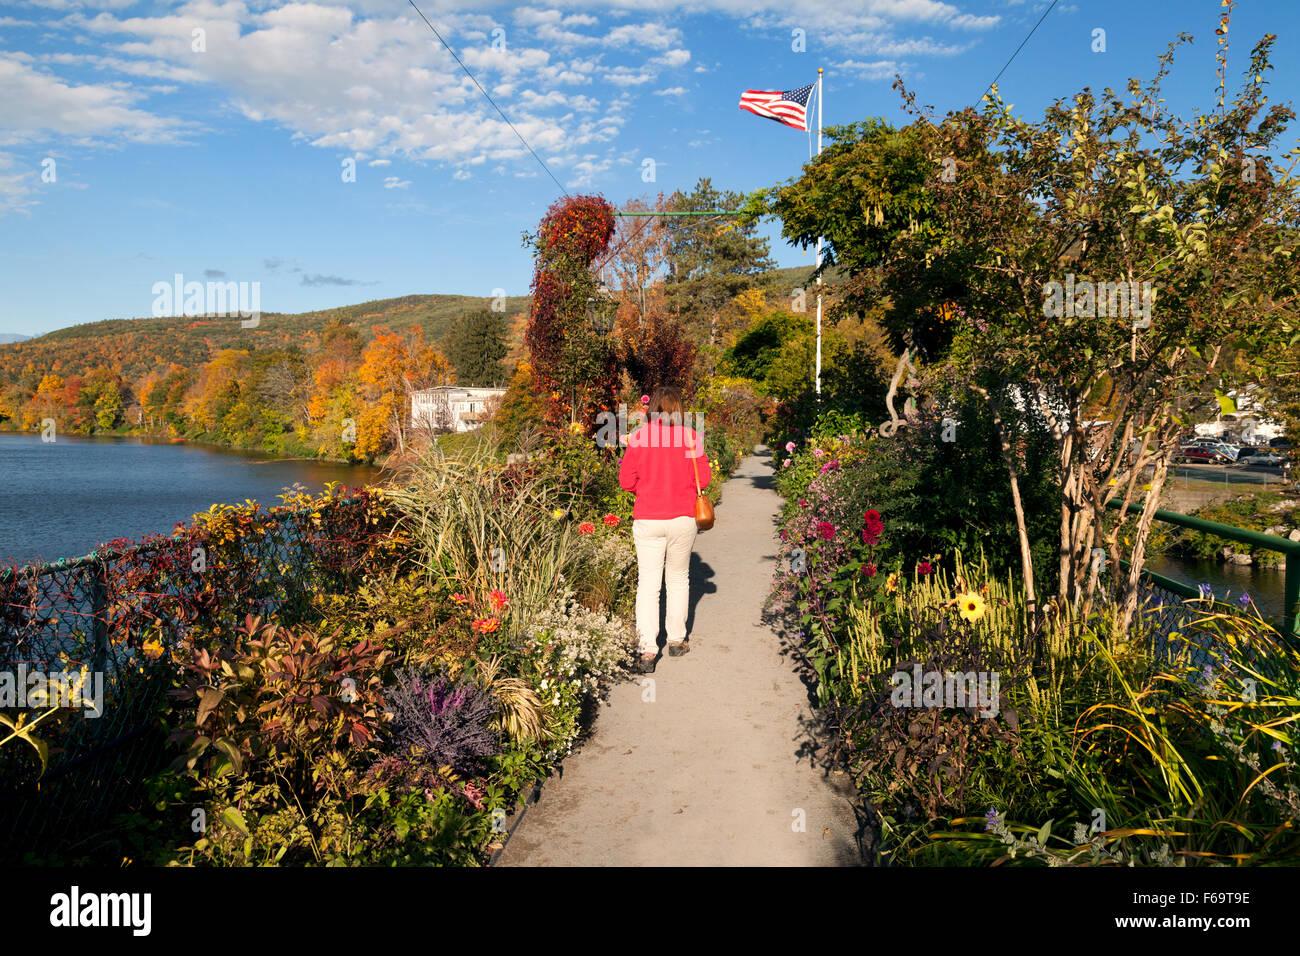 A tourist crossing the Bridge of Flowers, Shelburne Falls, Massachusetts MA New England USA - Stock Image